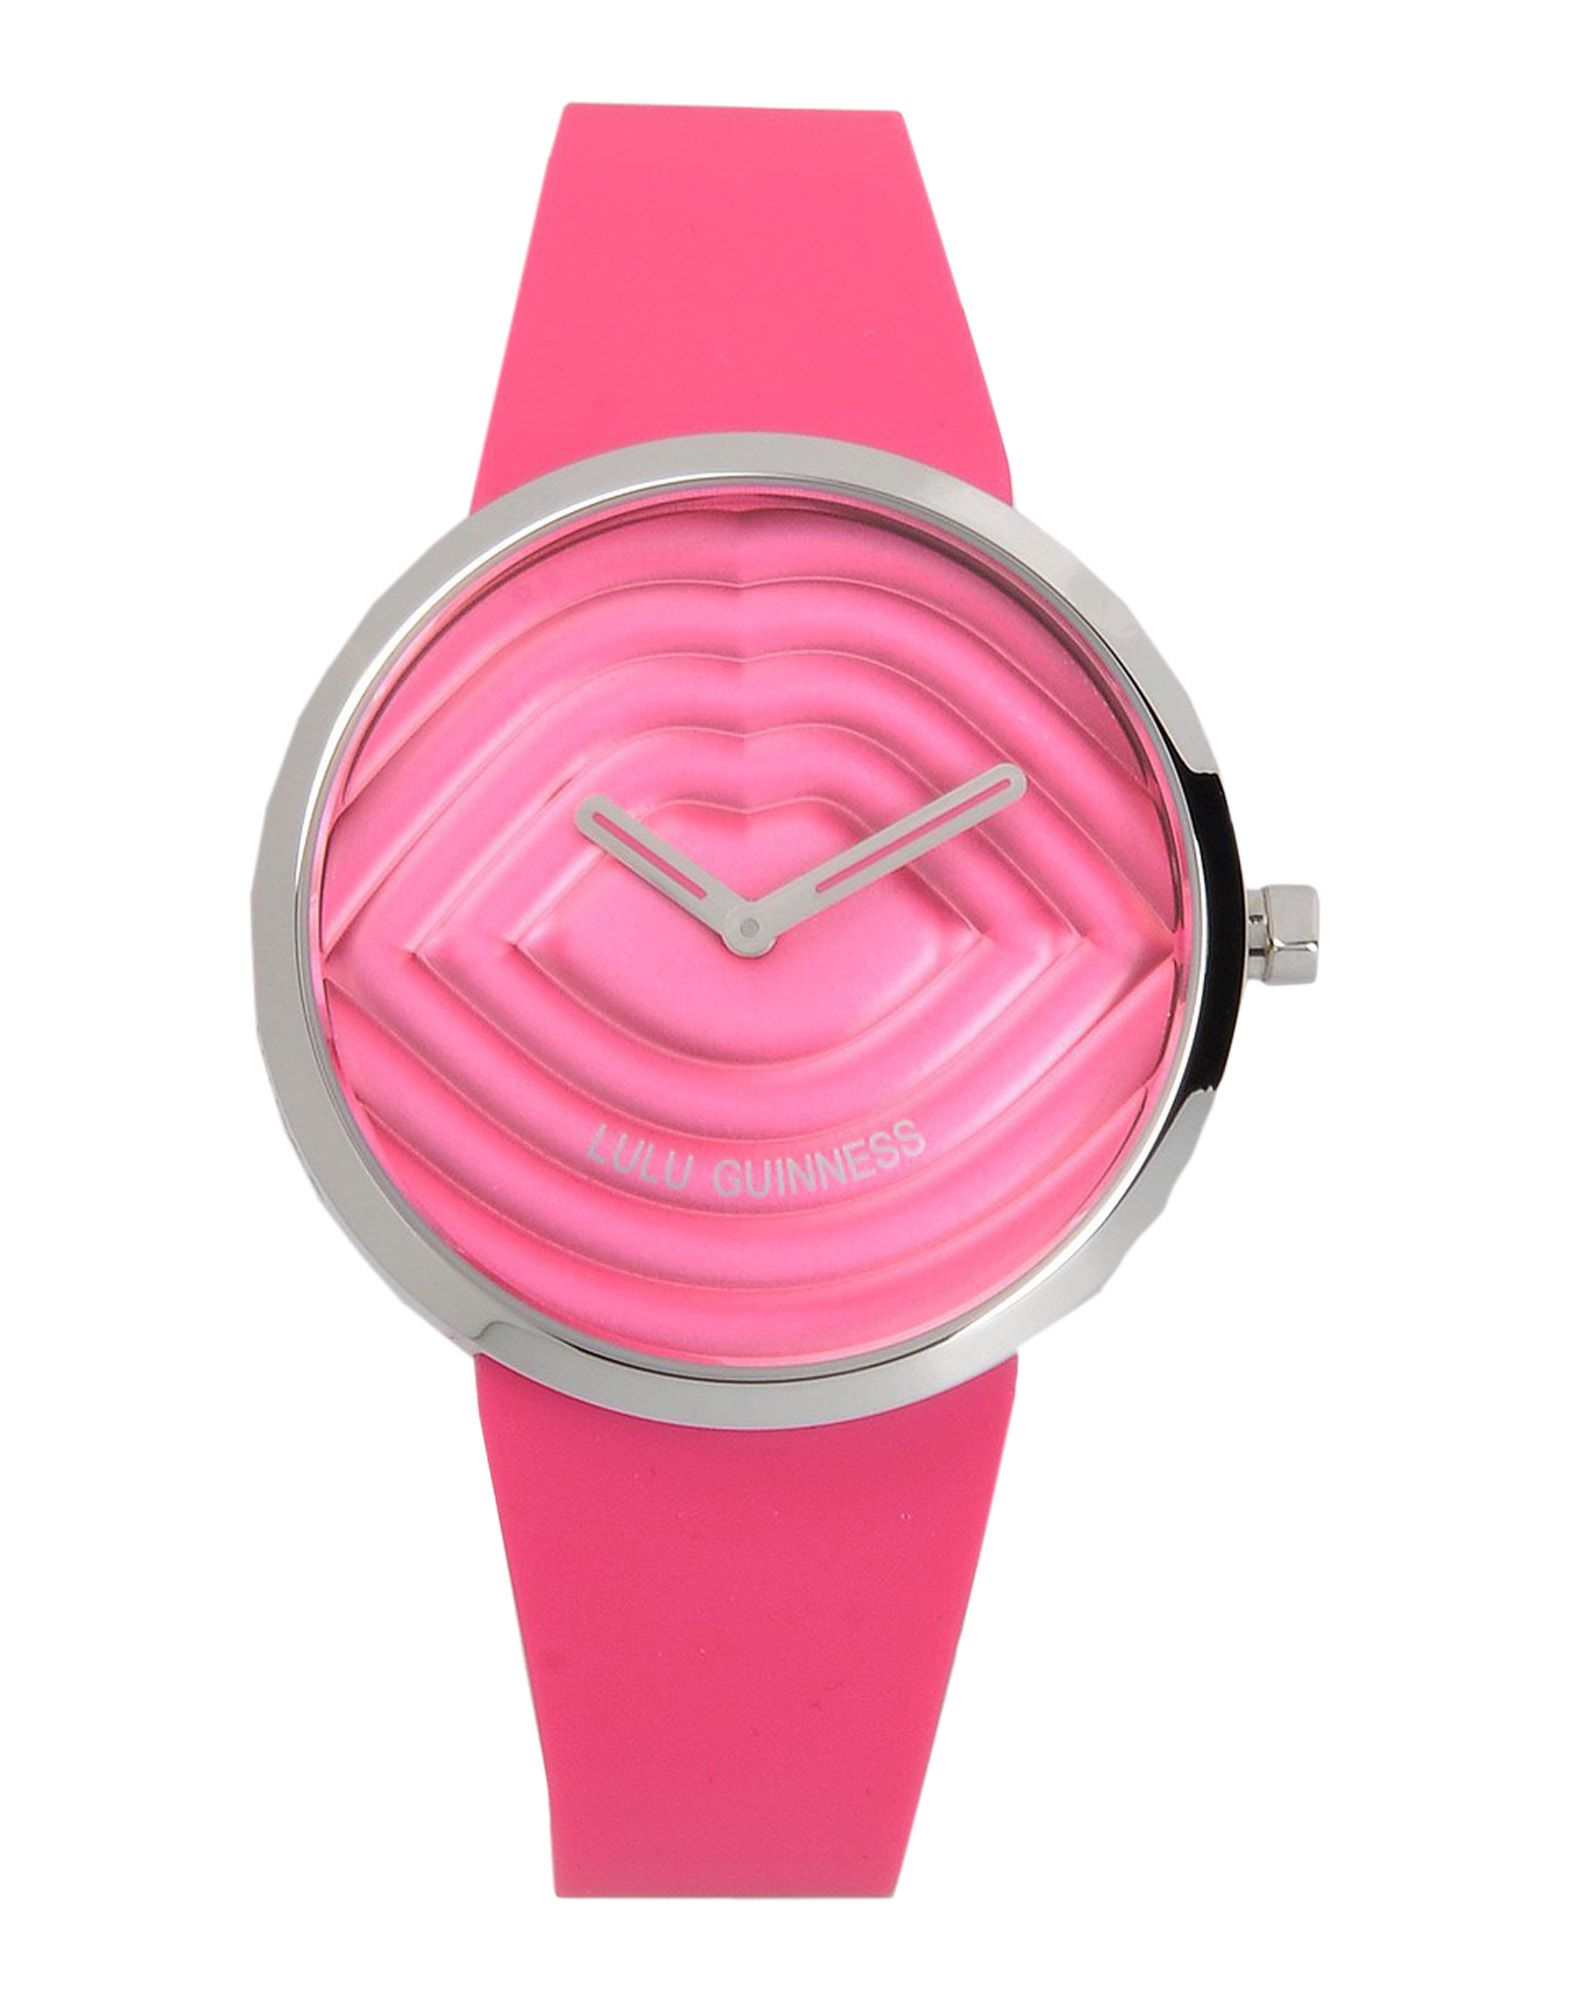 LULU GUINNESS Wrist watches